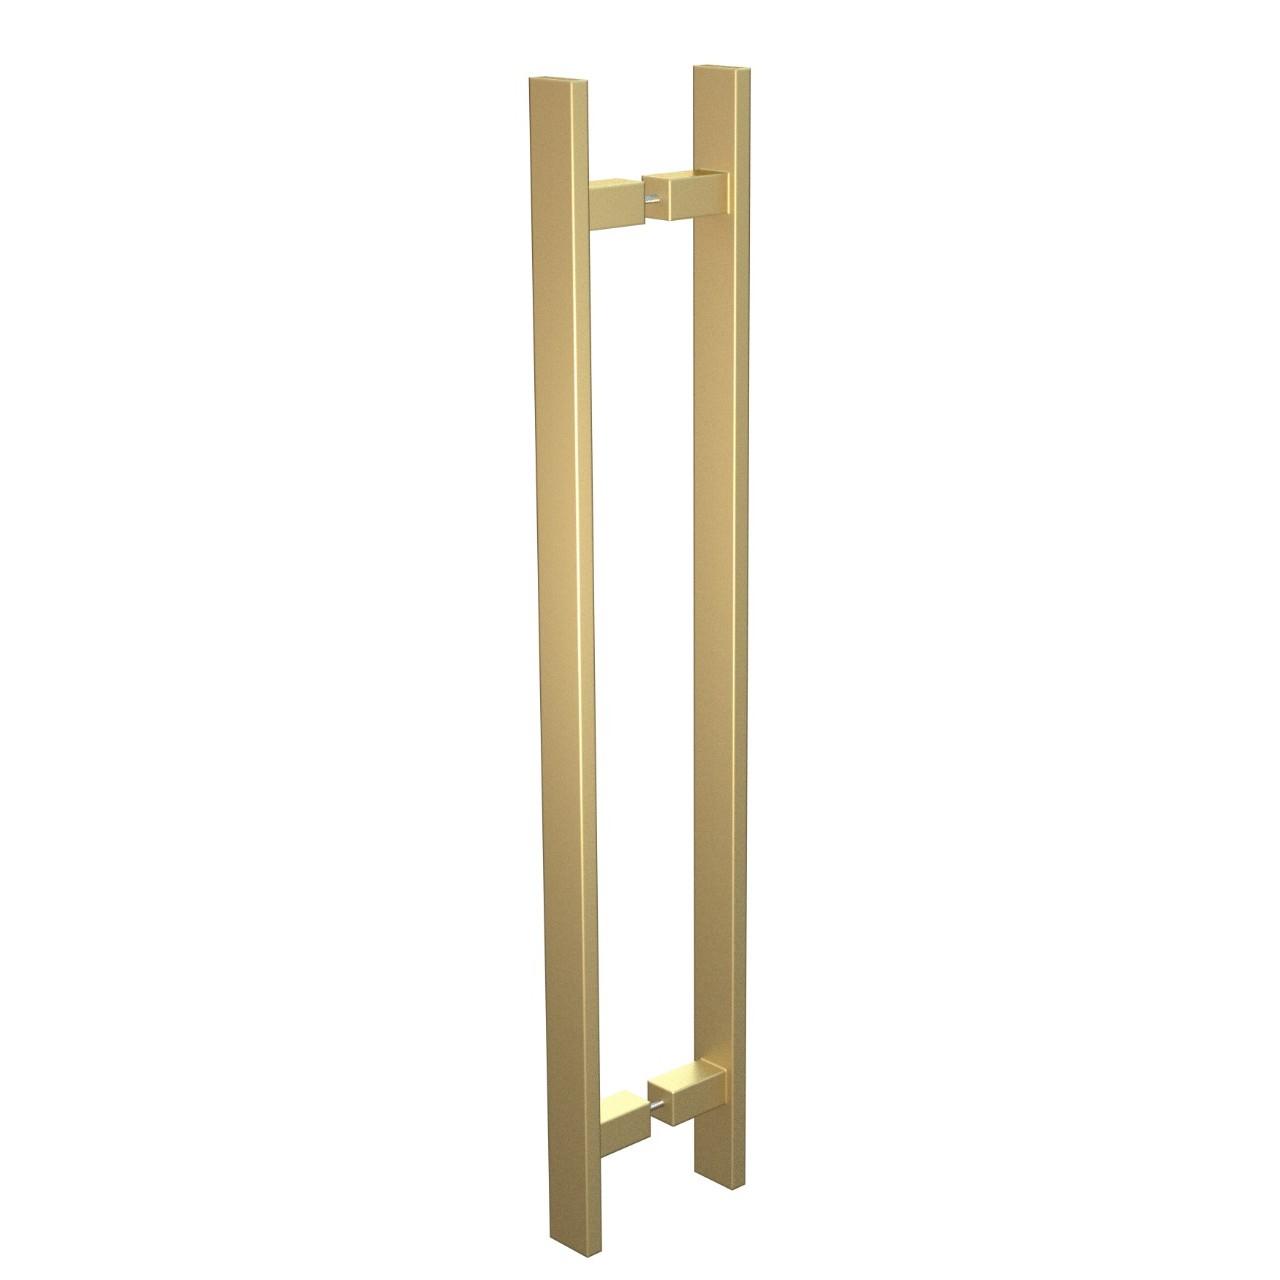 Puxador de Portas Sobrepor Aco Inox 40 cm 1 par Trio Gold - Acobrasil